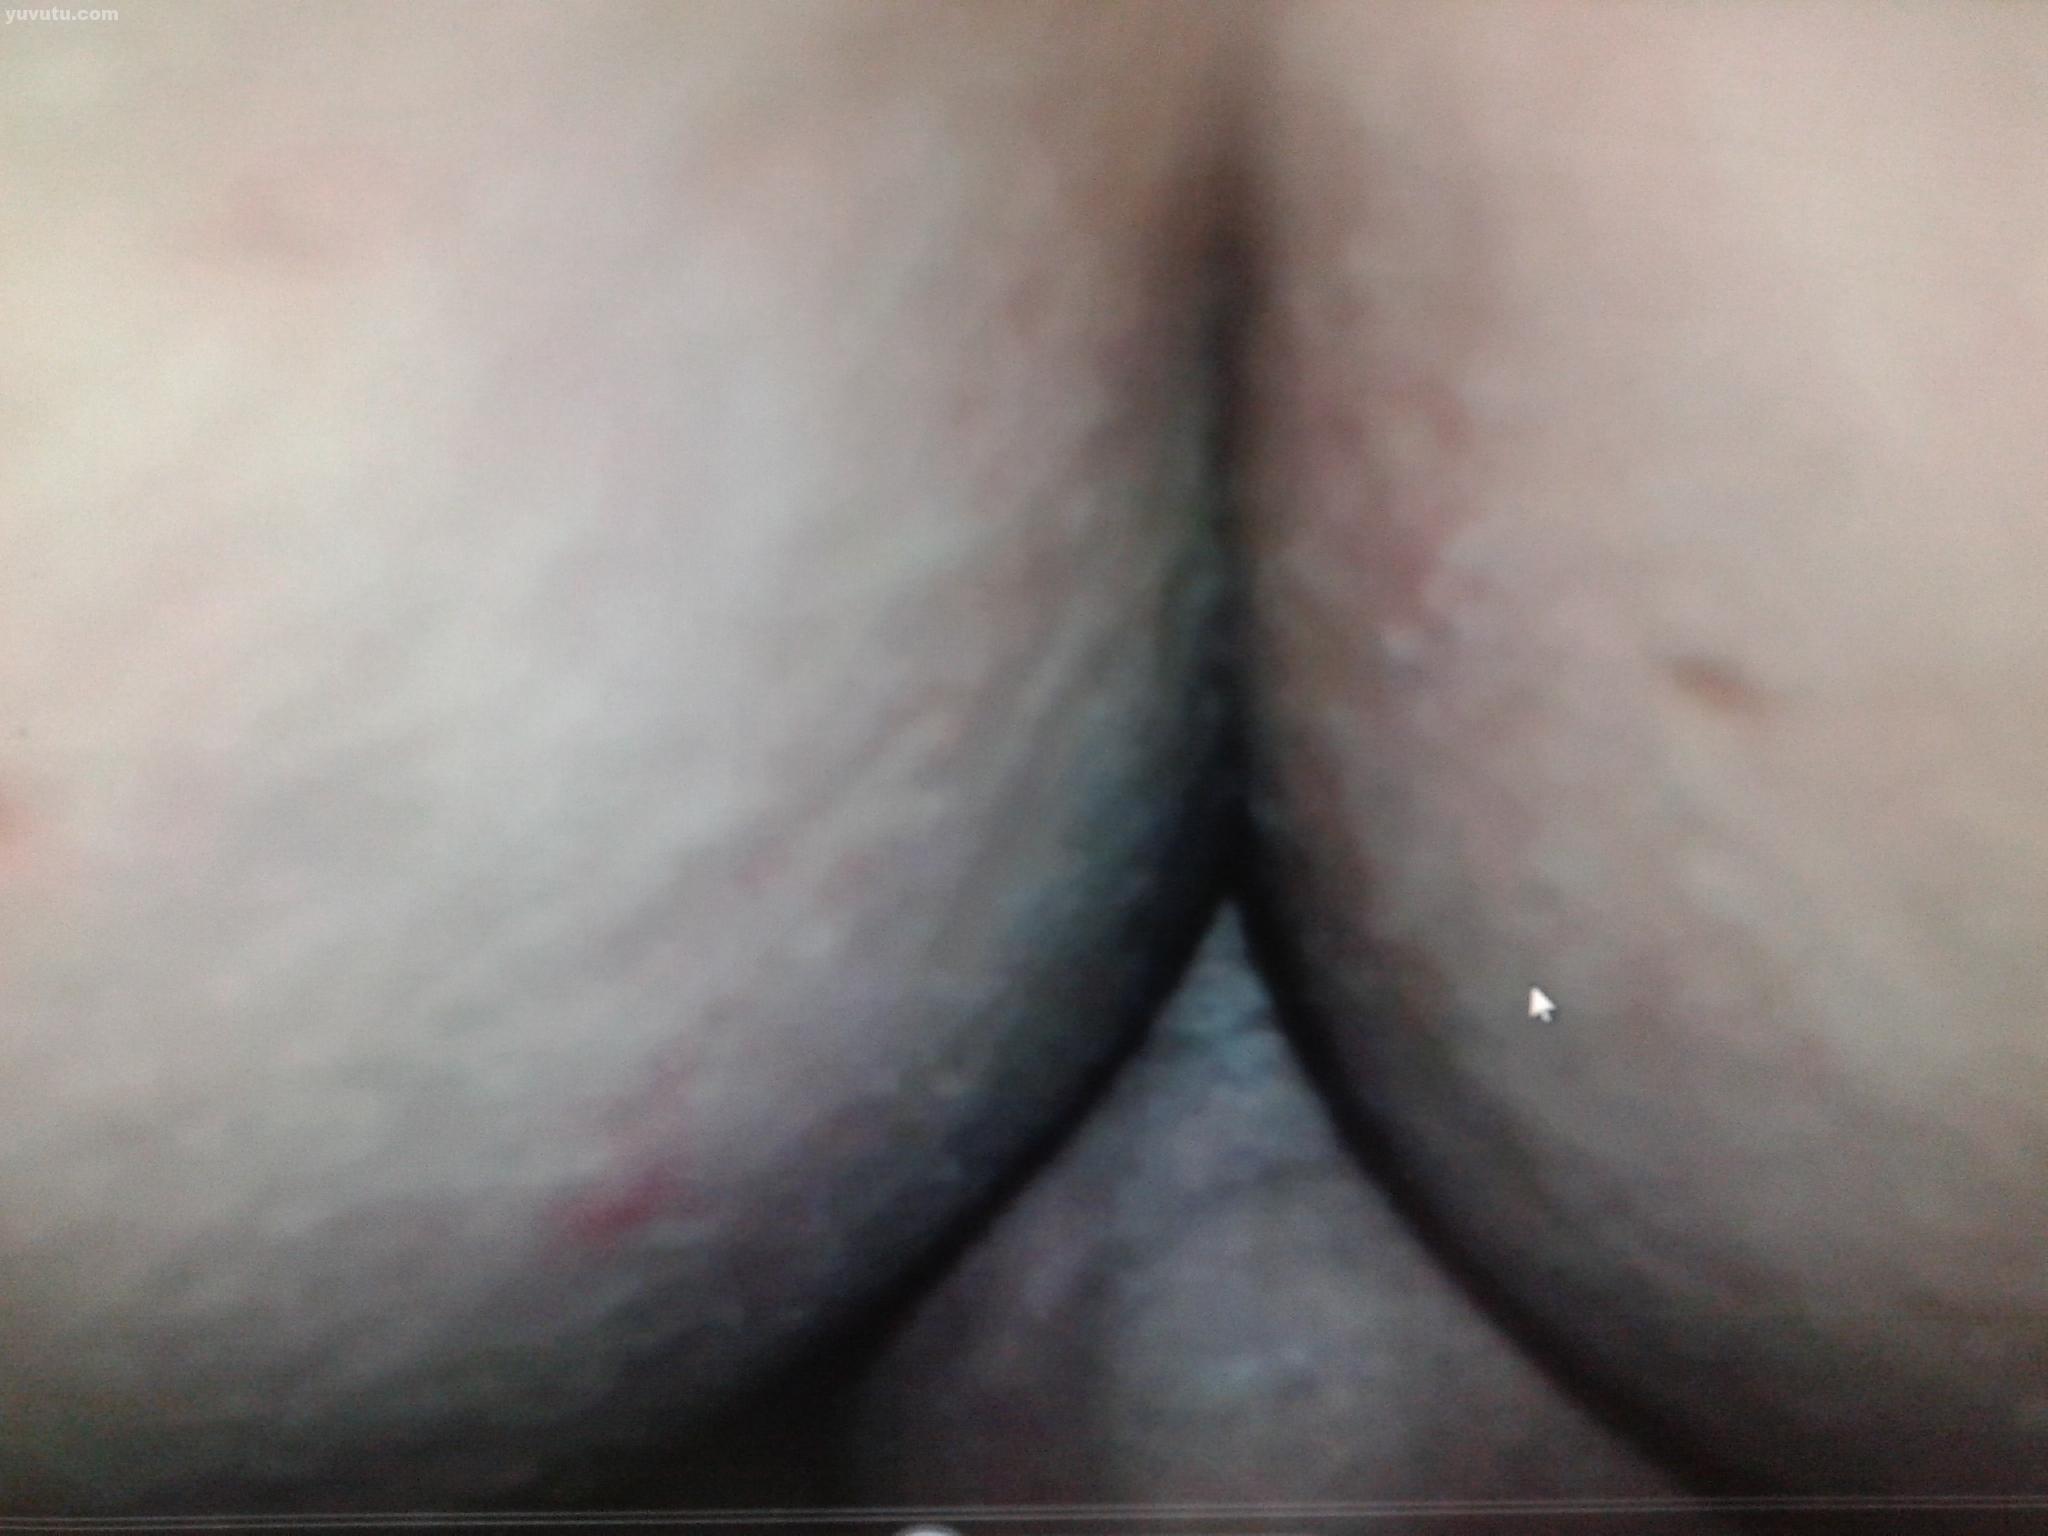 asss - anal on yuvutu homemade amateur porn movies and xxx sex videos